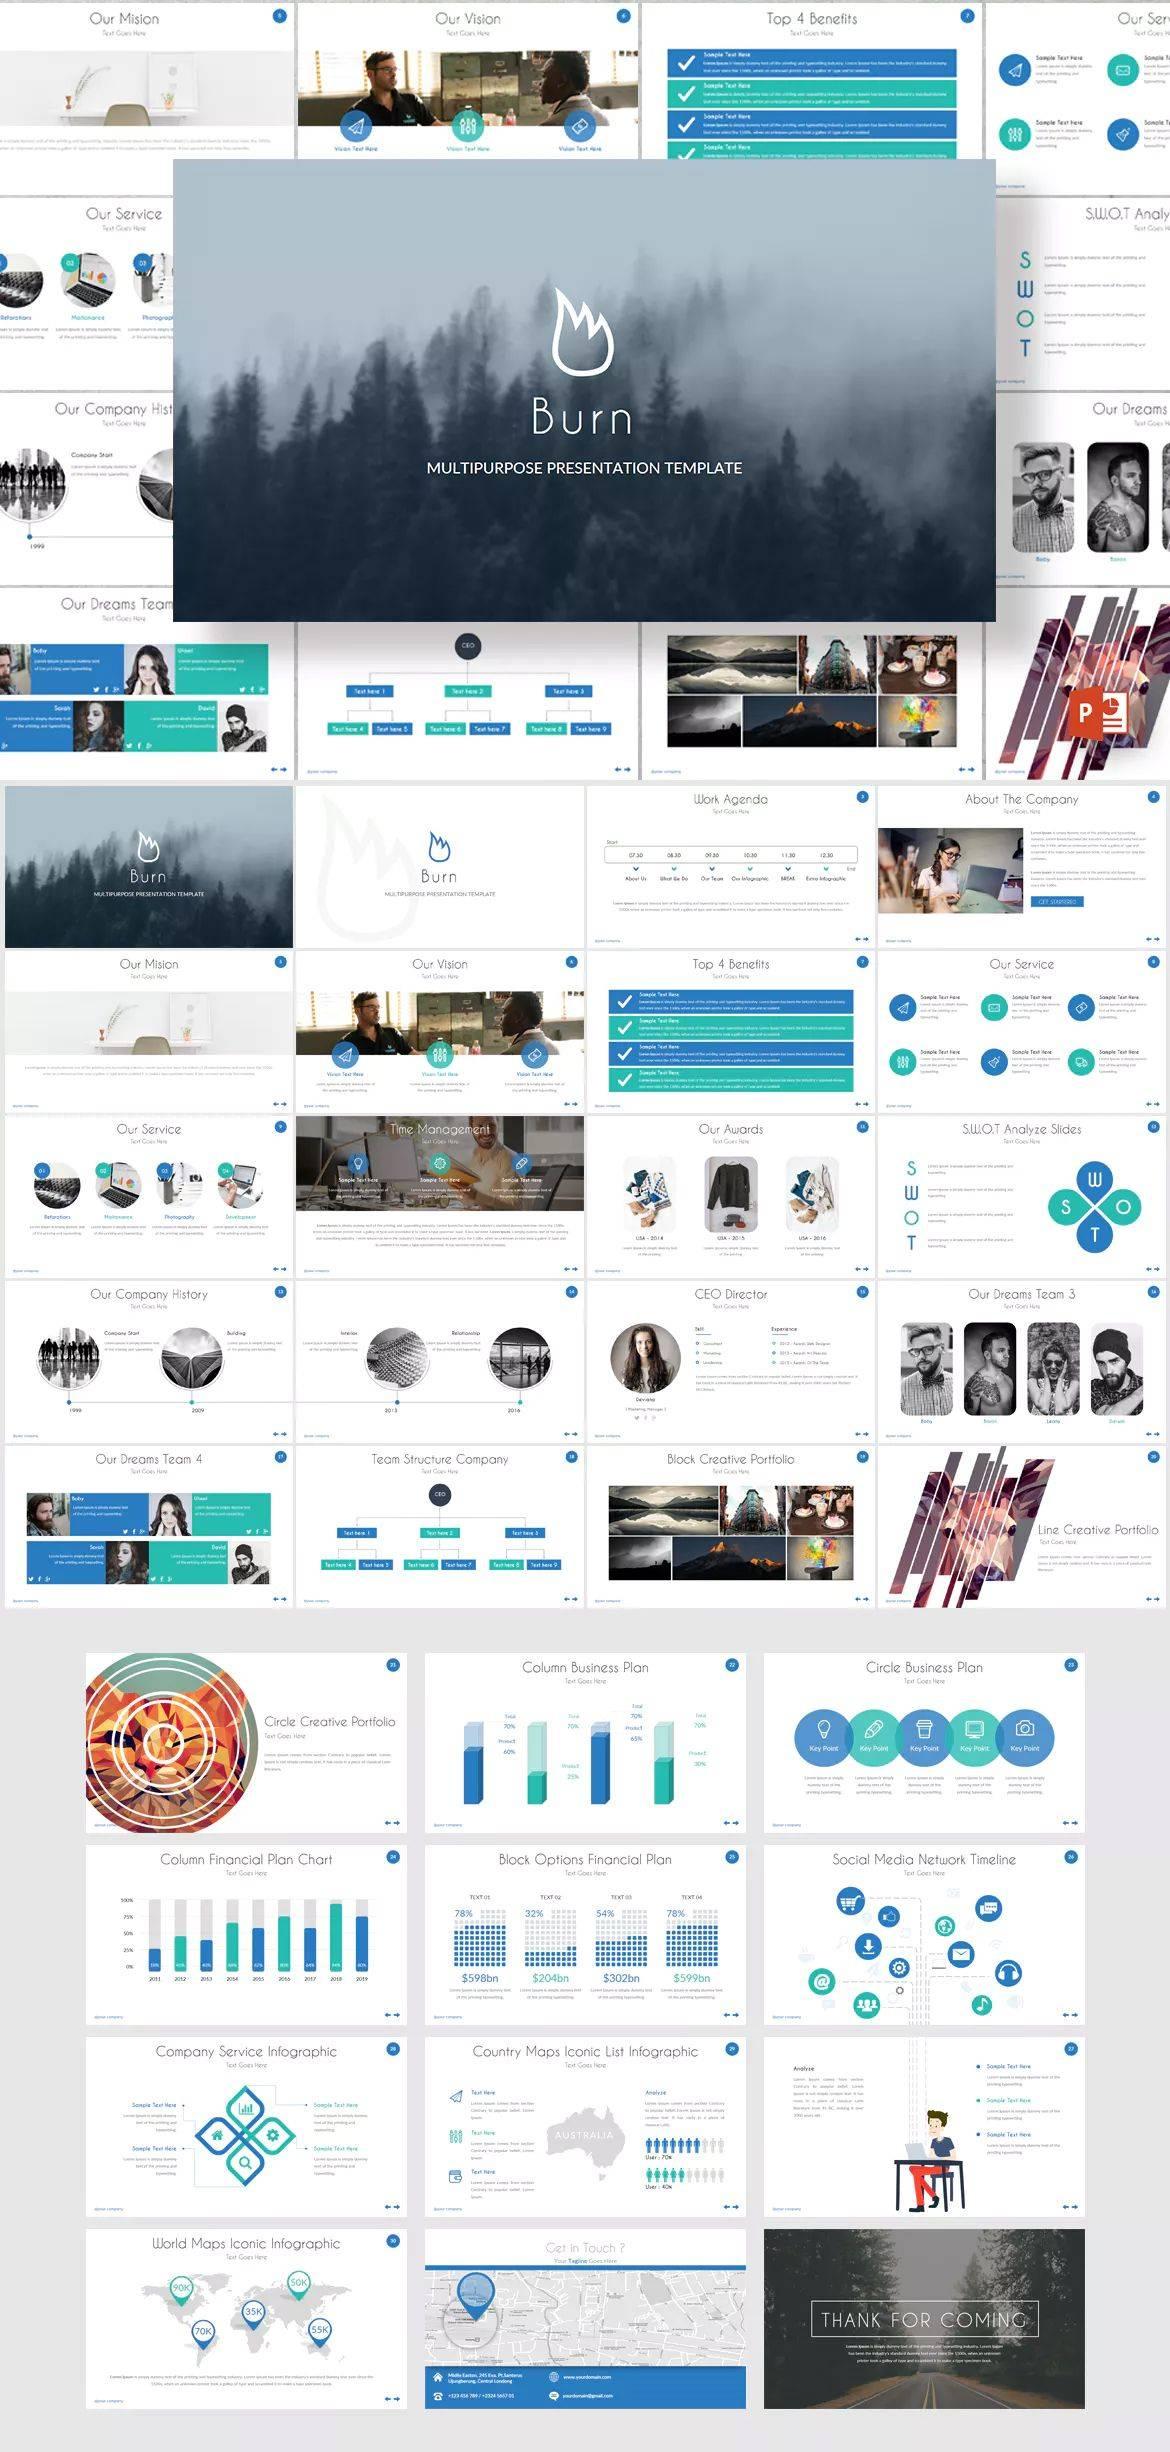 Powerpoint Slide Template Design